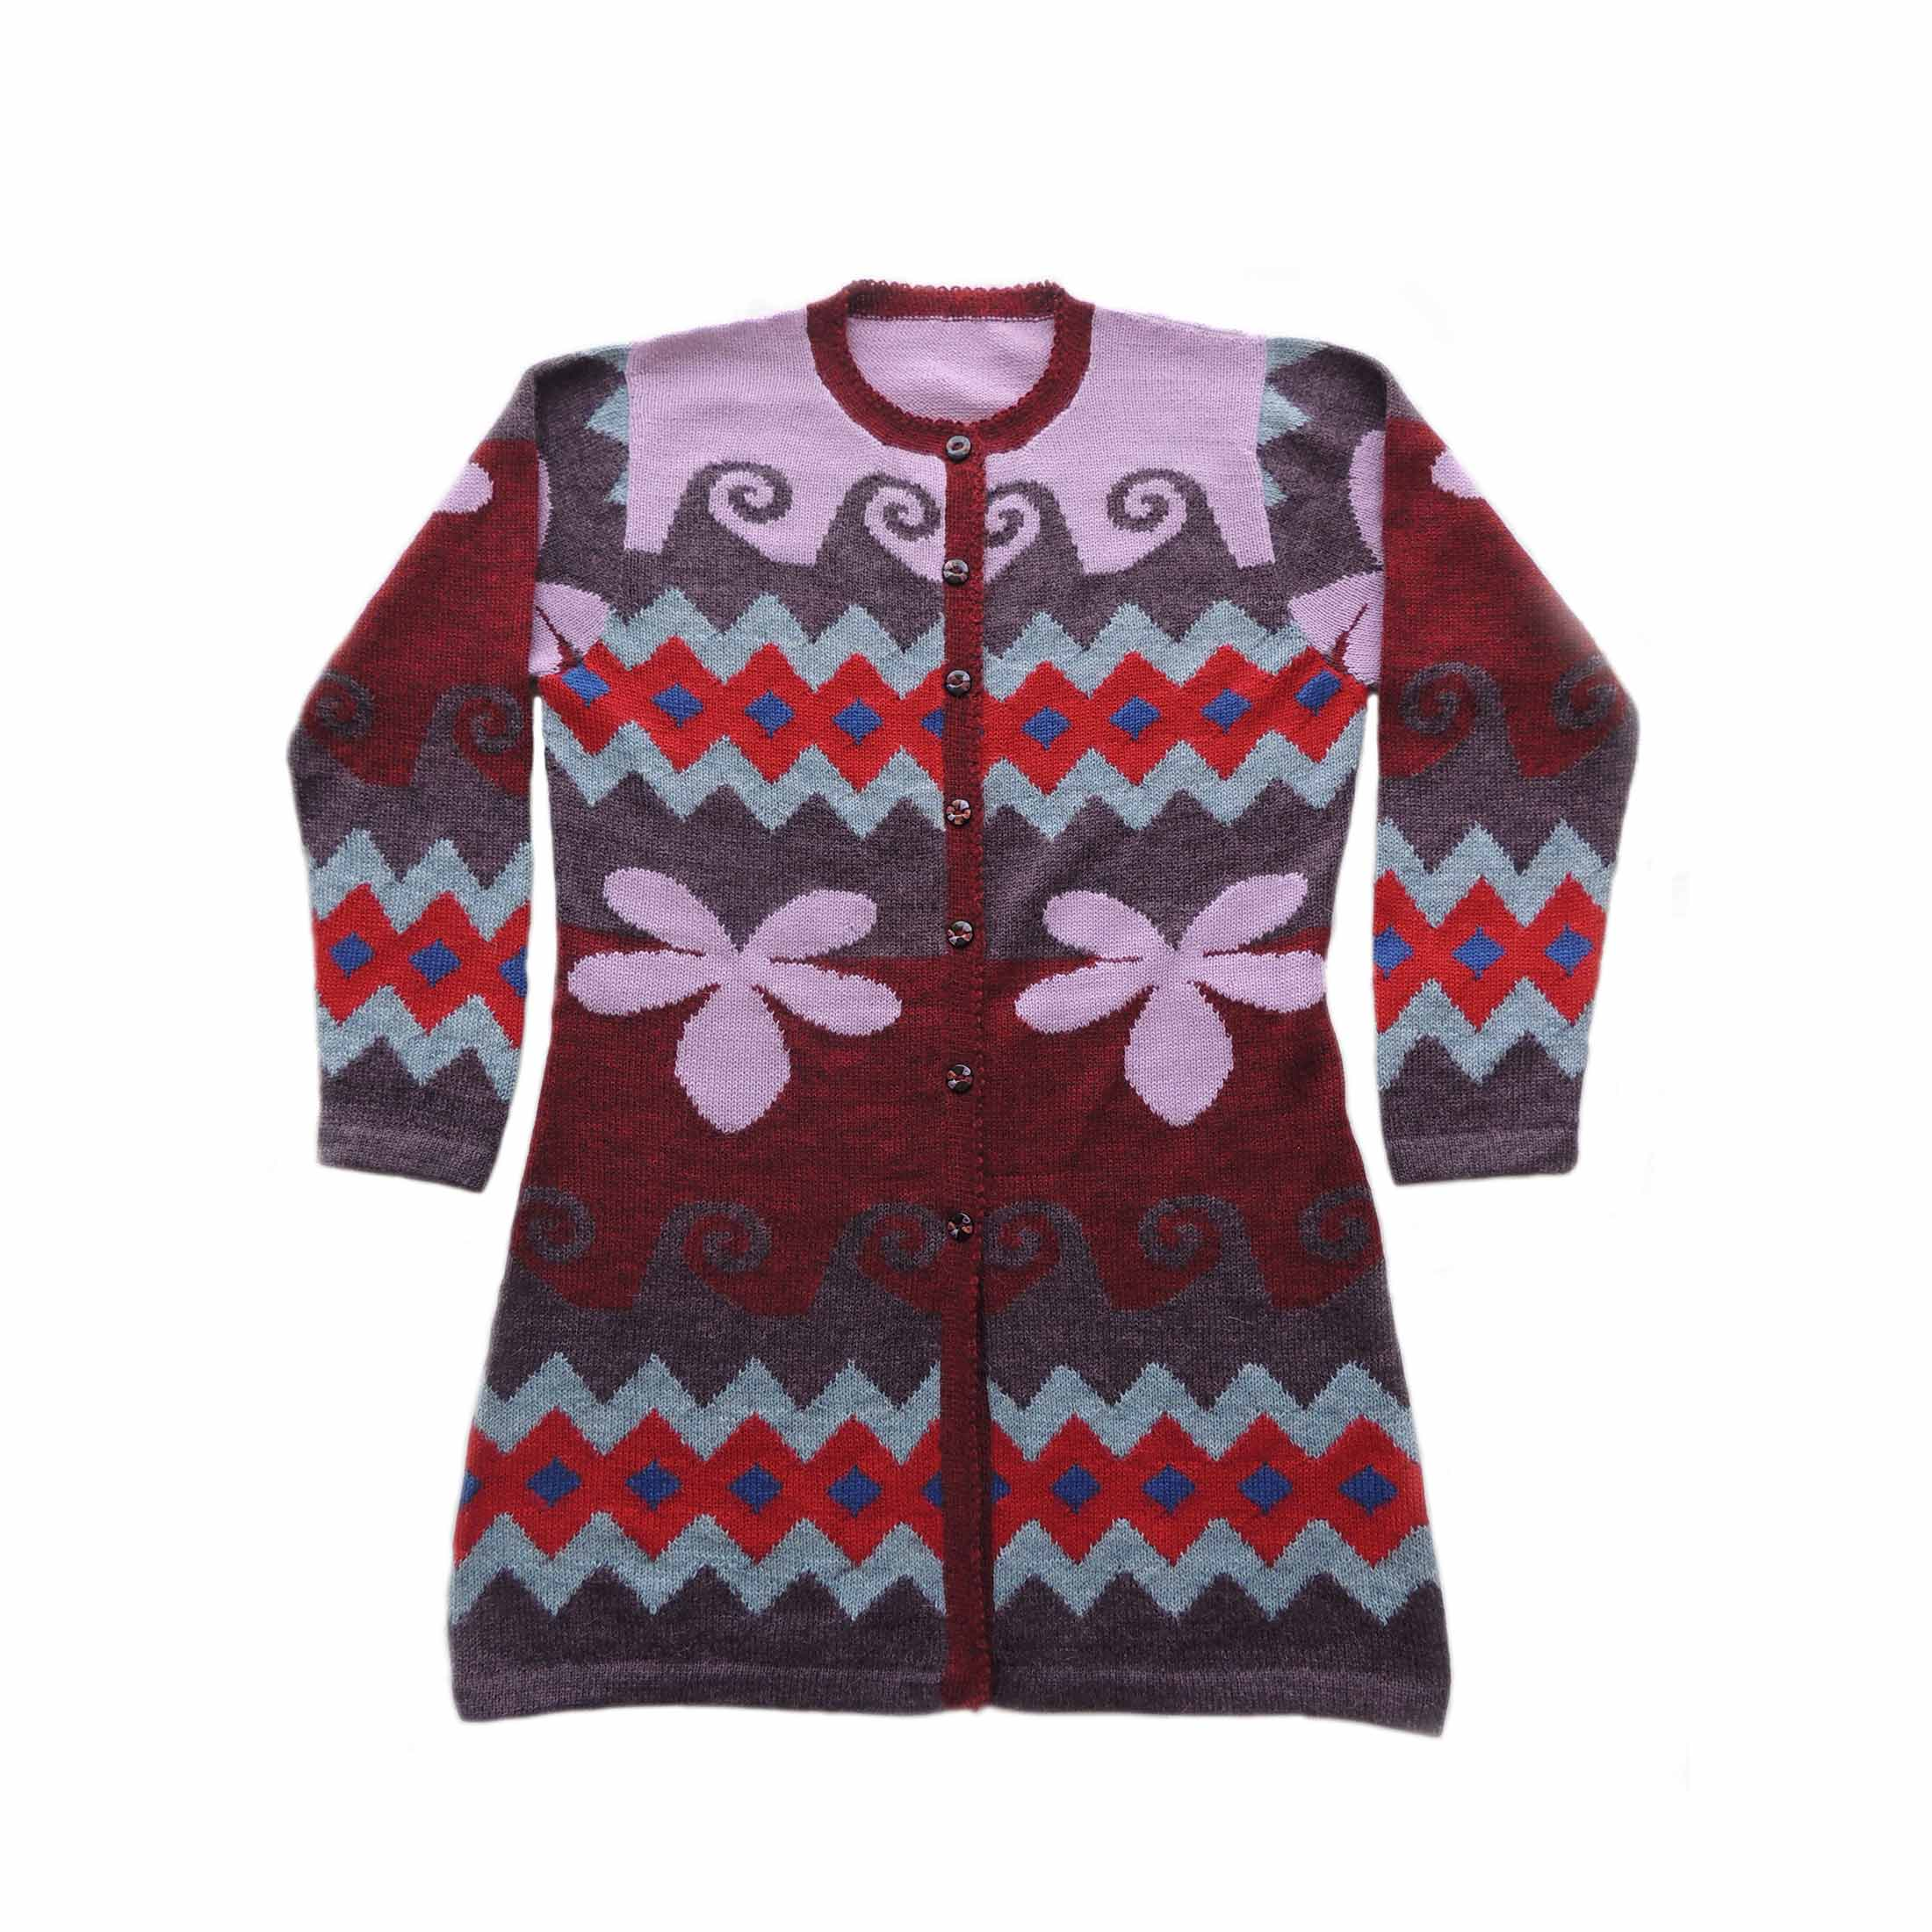 PopsFL Wholesale Intarsia knitting collection women's cardigan alpaca